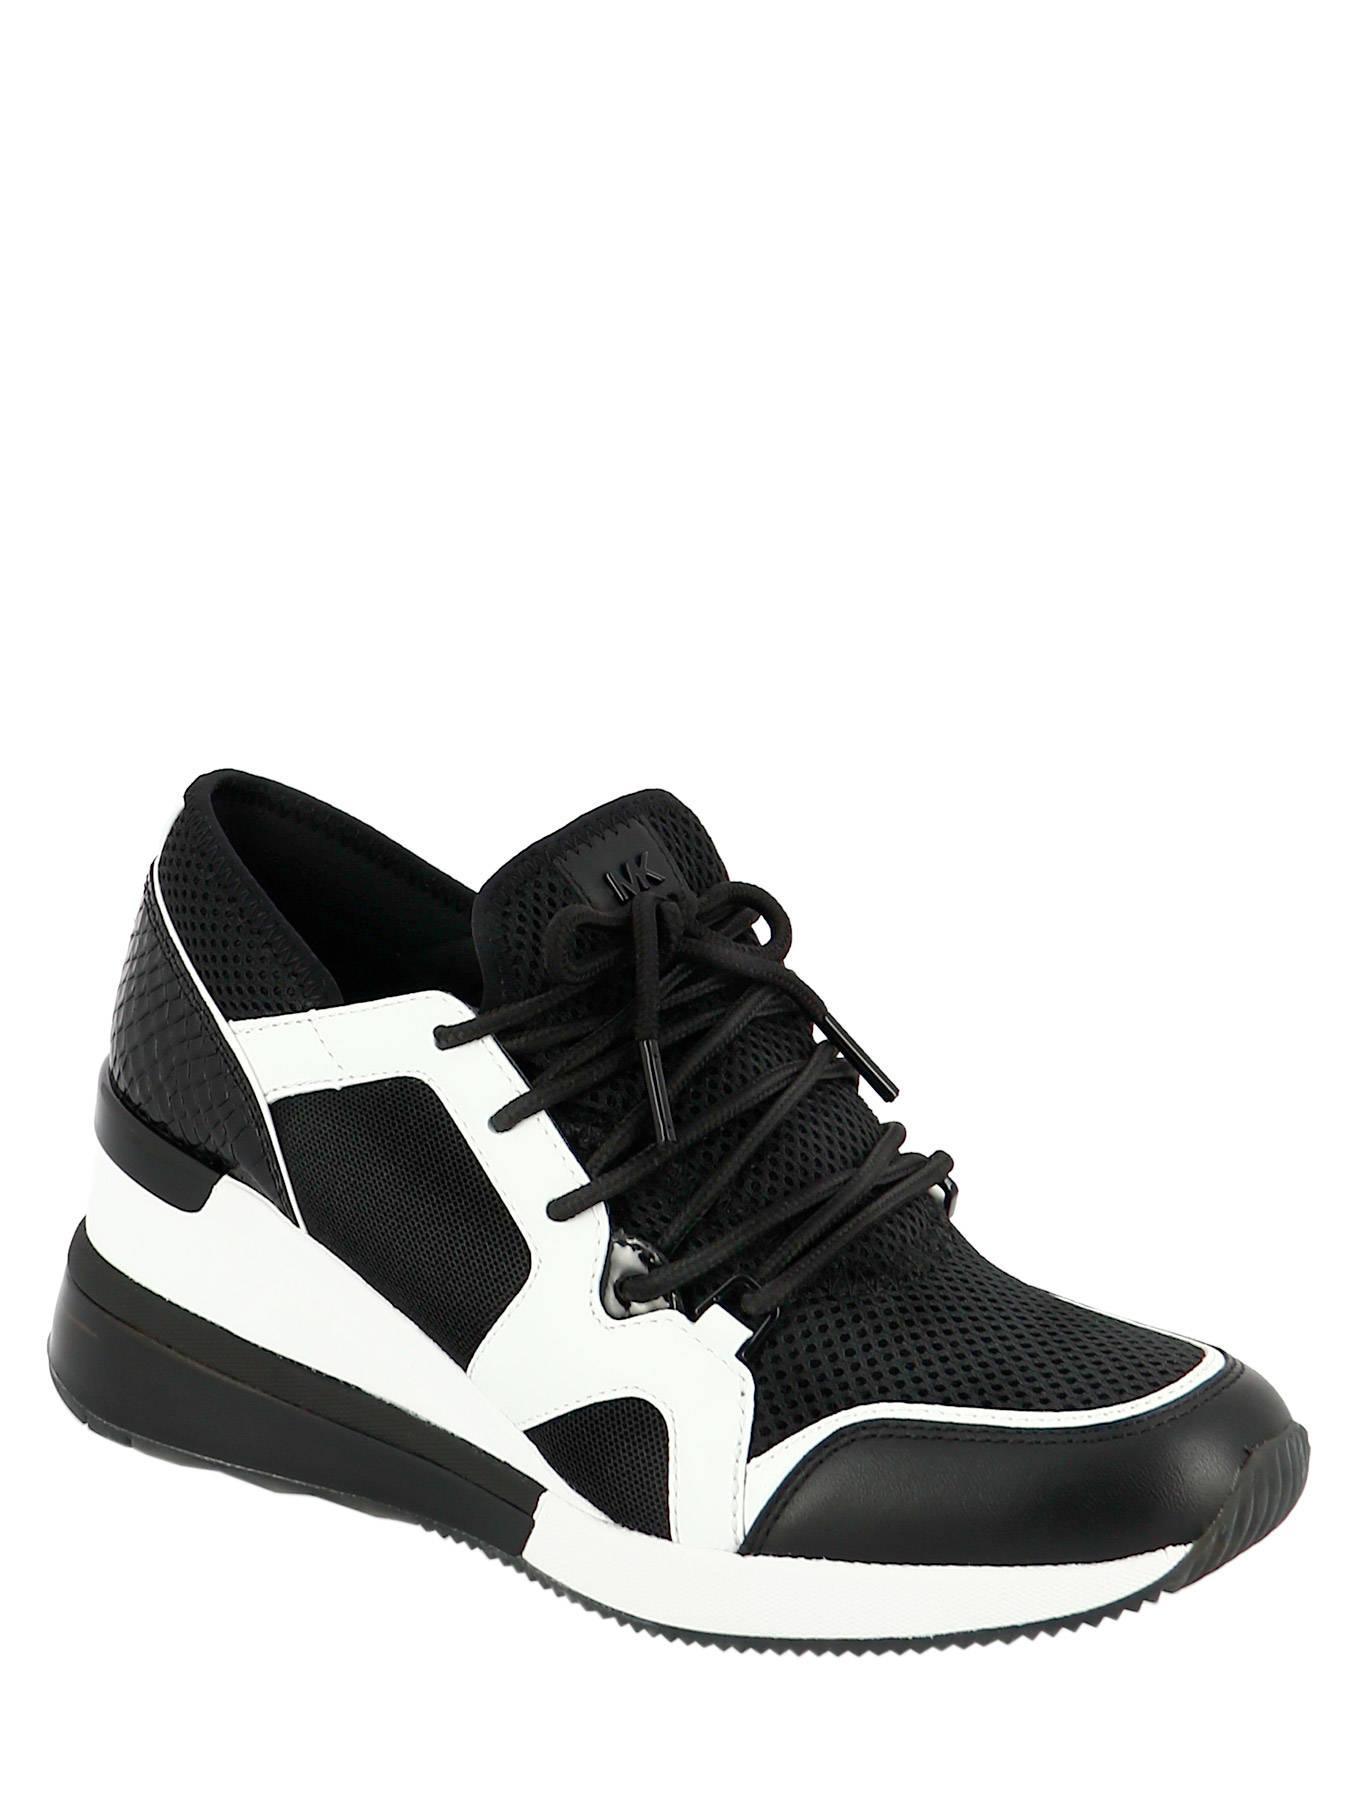 2788663f395 Michael Kors Sneakers 43.S9LVFS9D - best prices